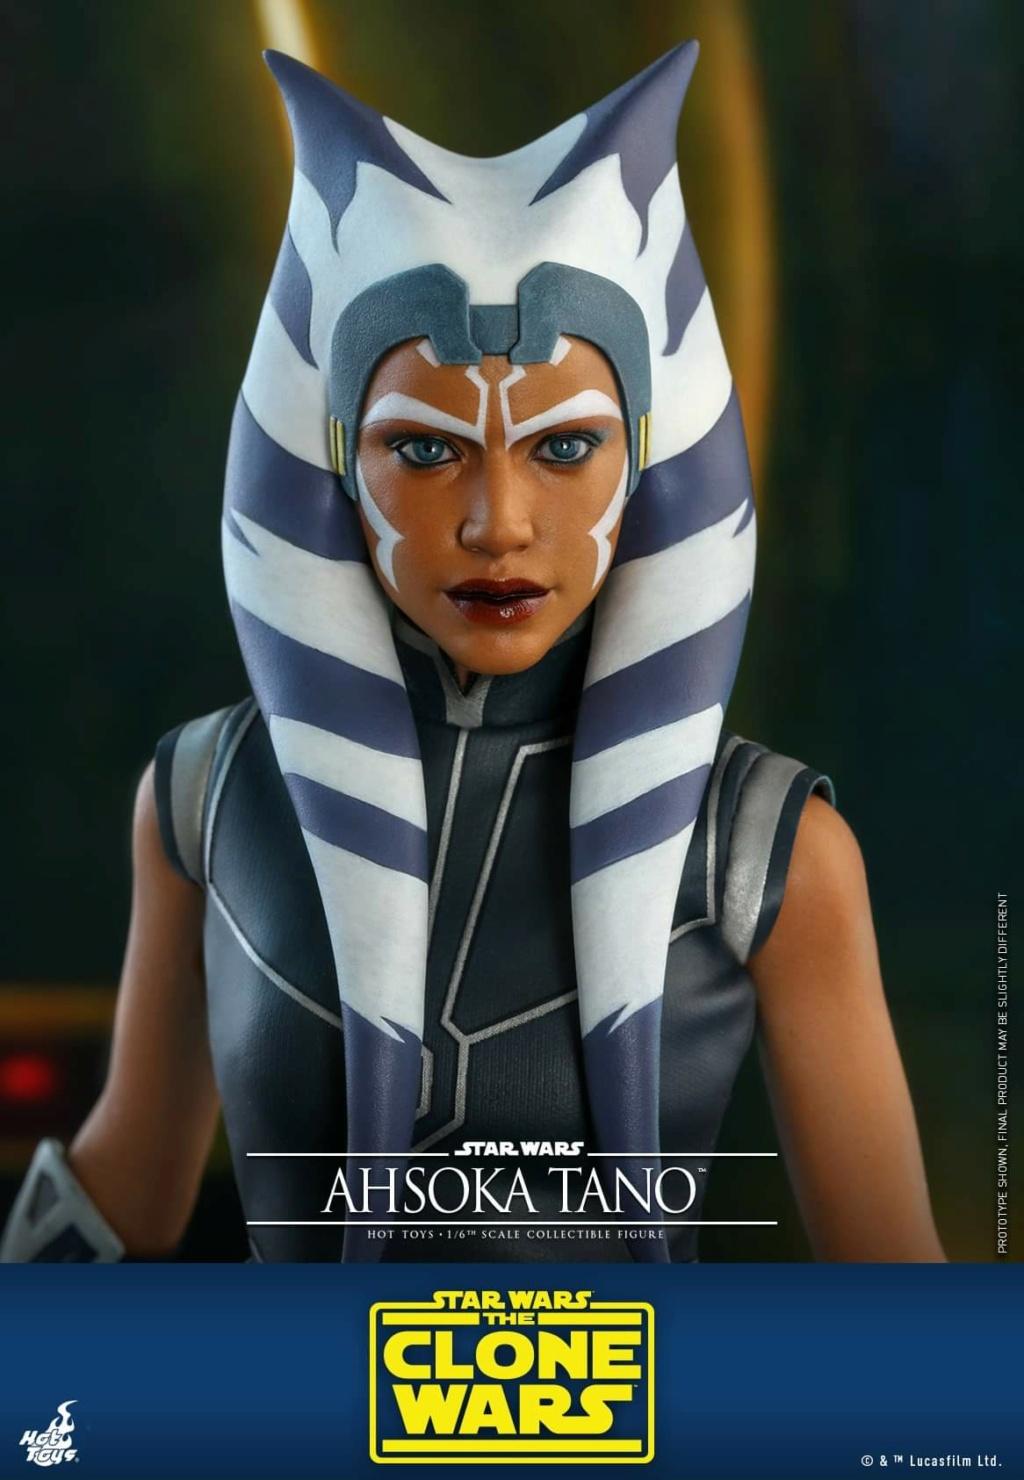 Ahsoka Tano - 1/6th scale - The Clone Wars - Hot Toys Fb_im140